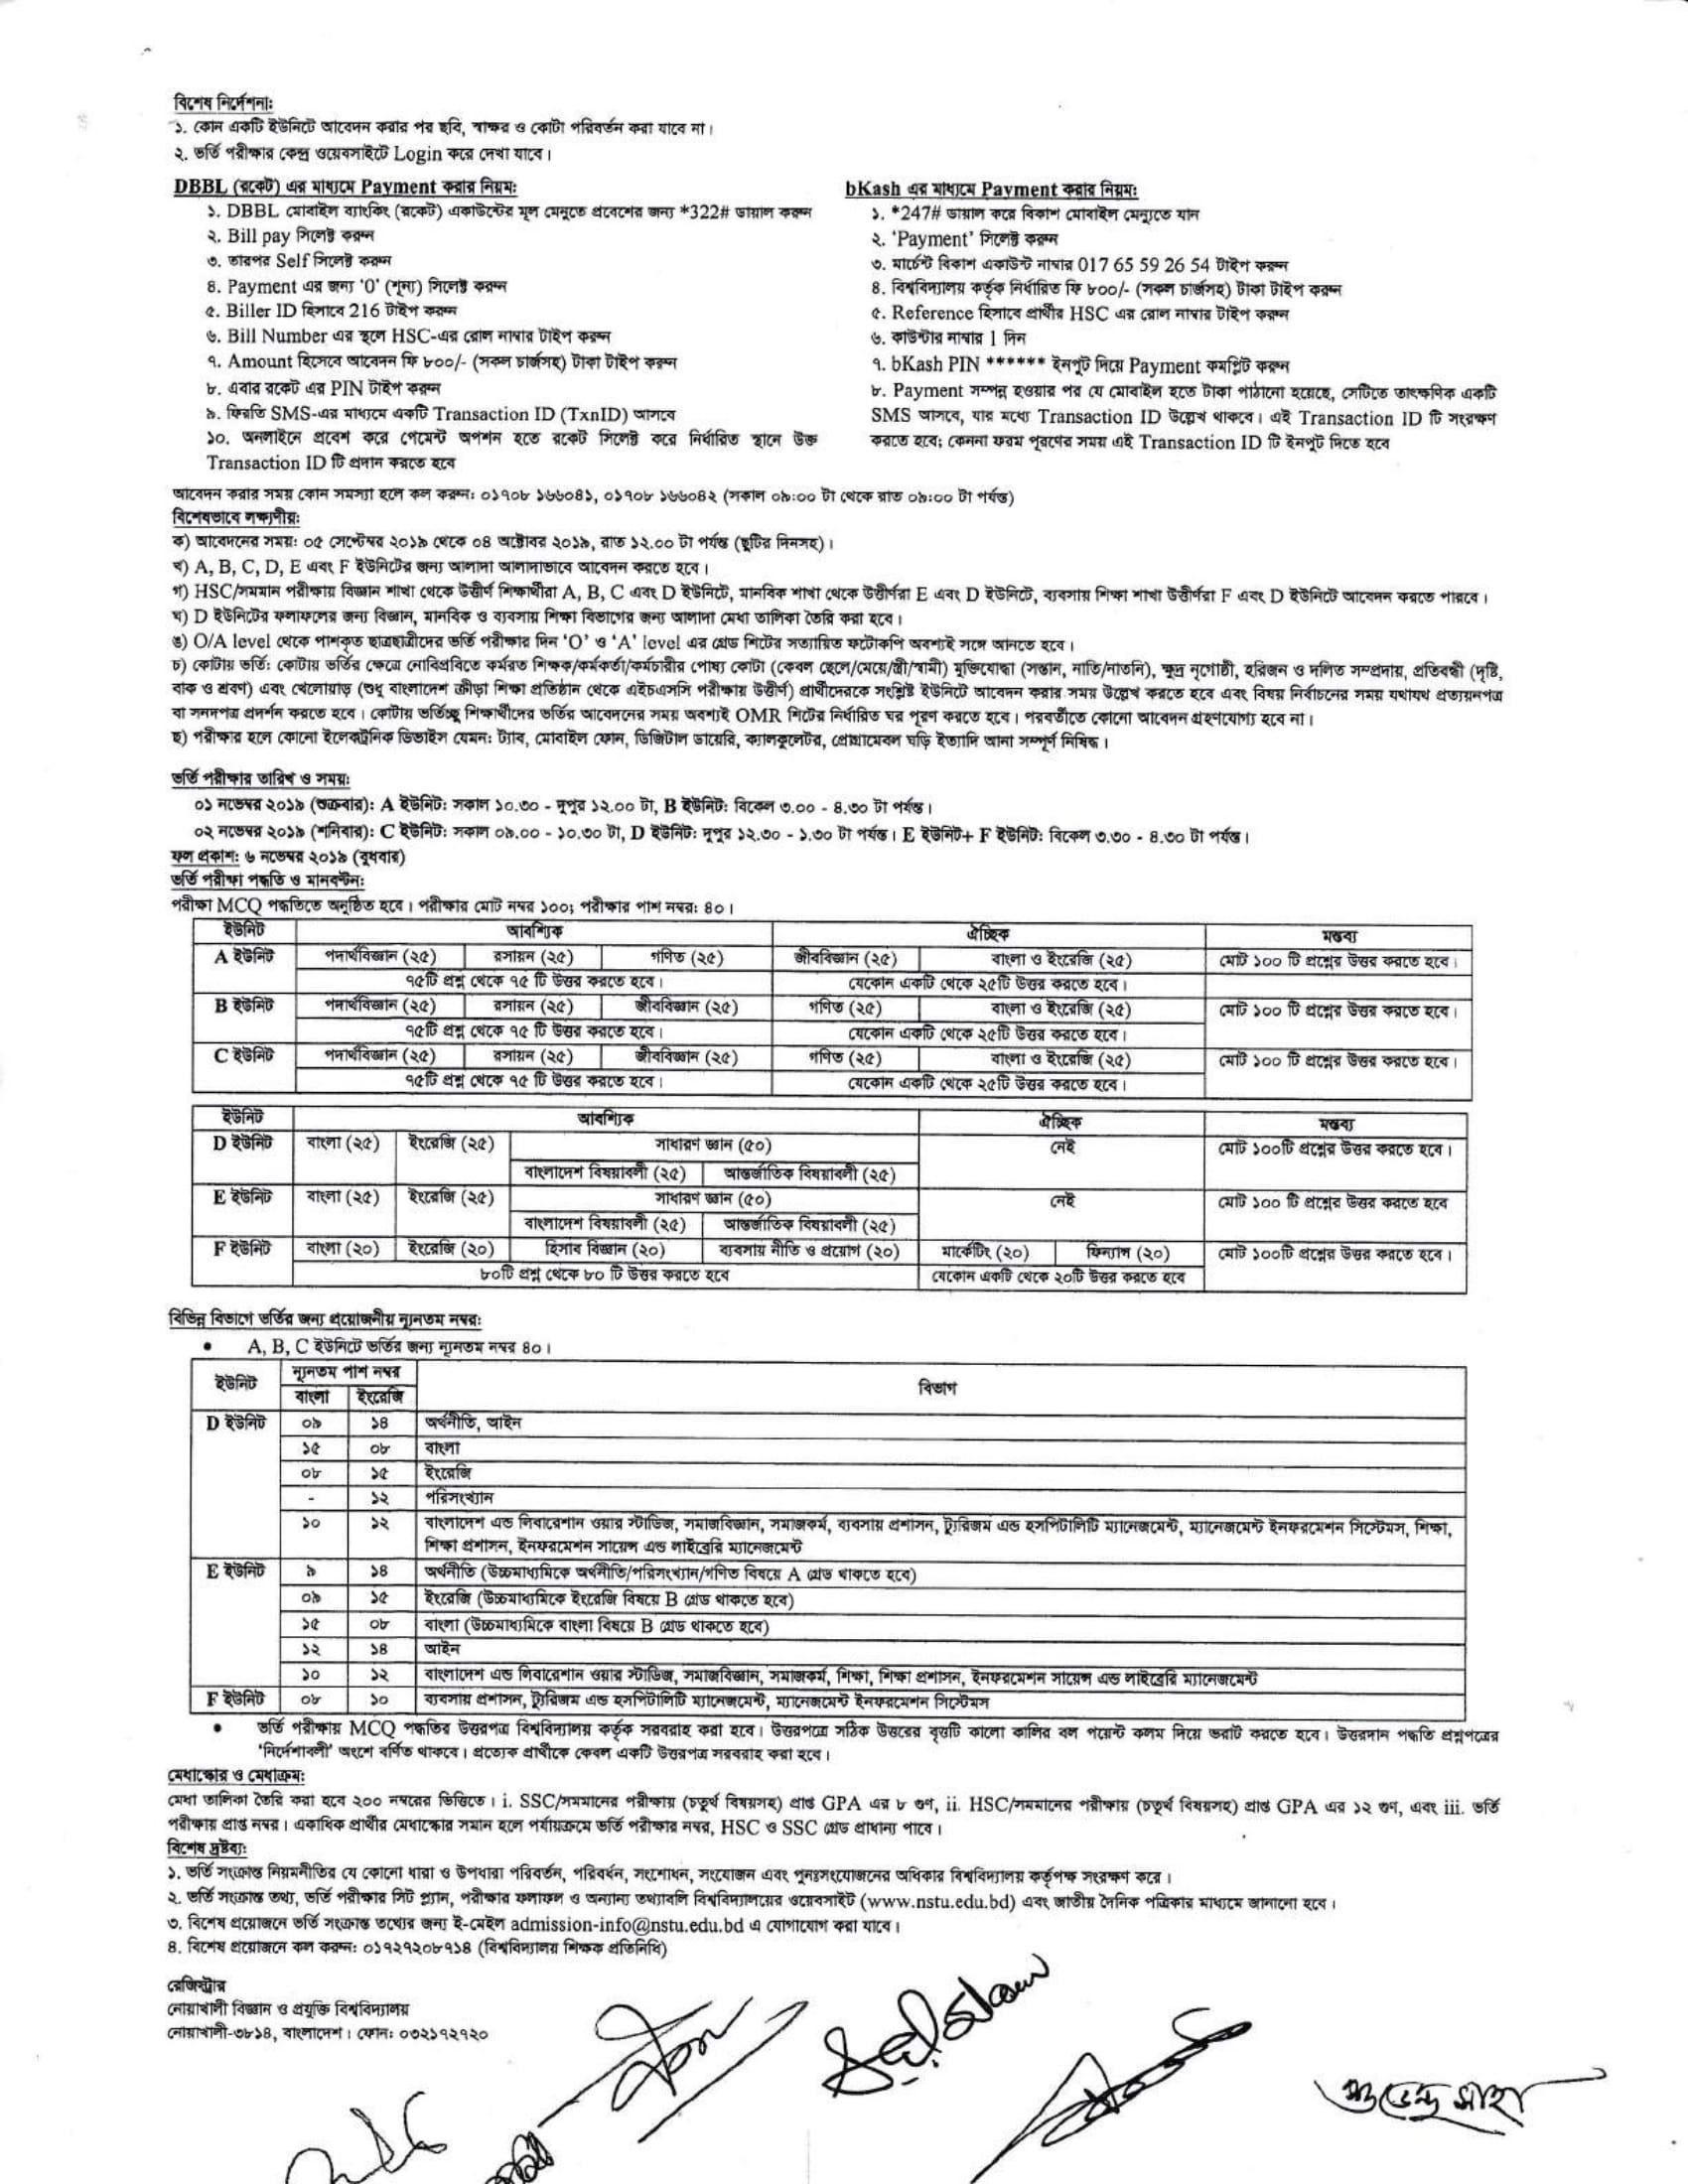 NSTU admission circular-2